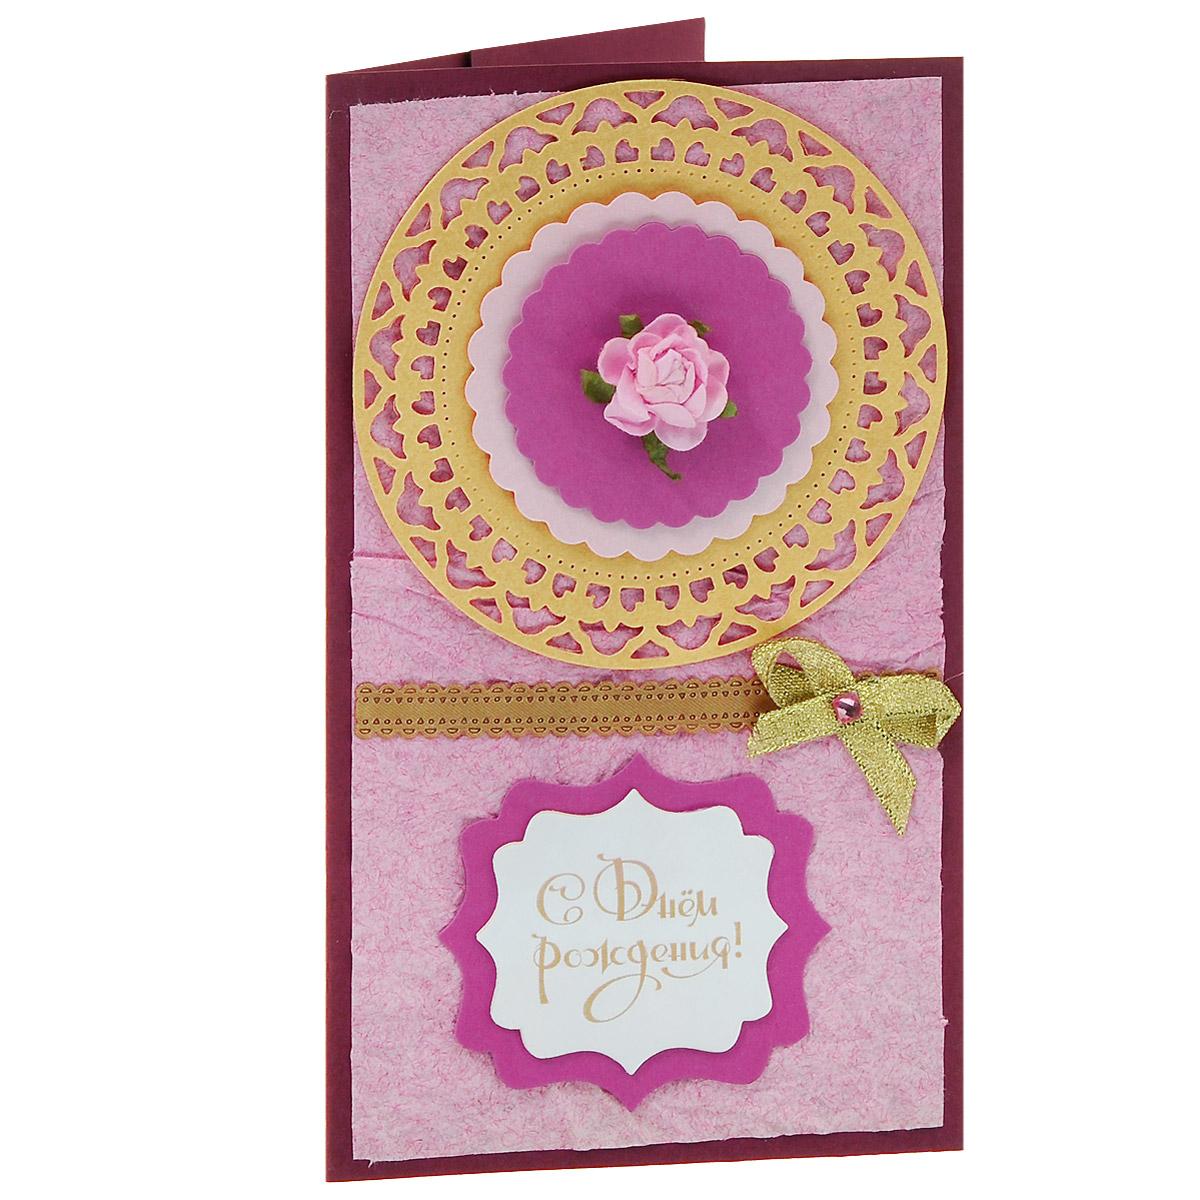 "Студия ""Тётя Роза"" ОЖ-0010 Открытка-конверт «С Днём Рождения!». Студия «Тётя Роза»"